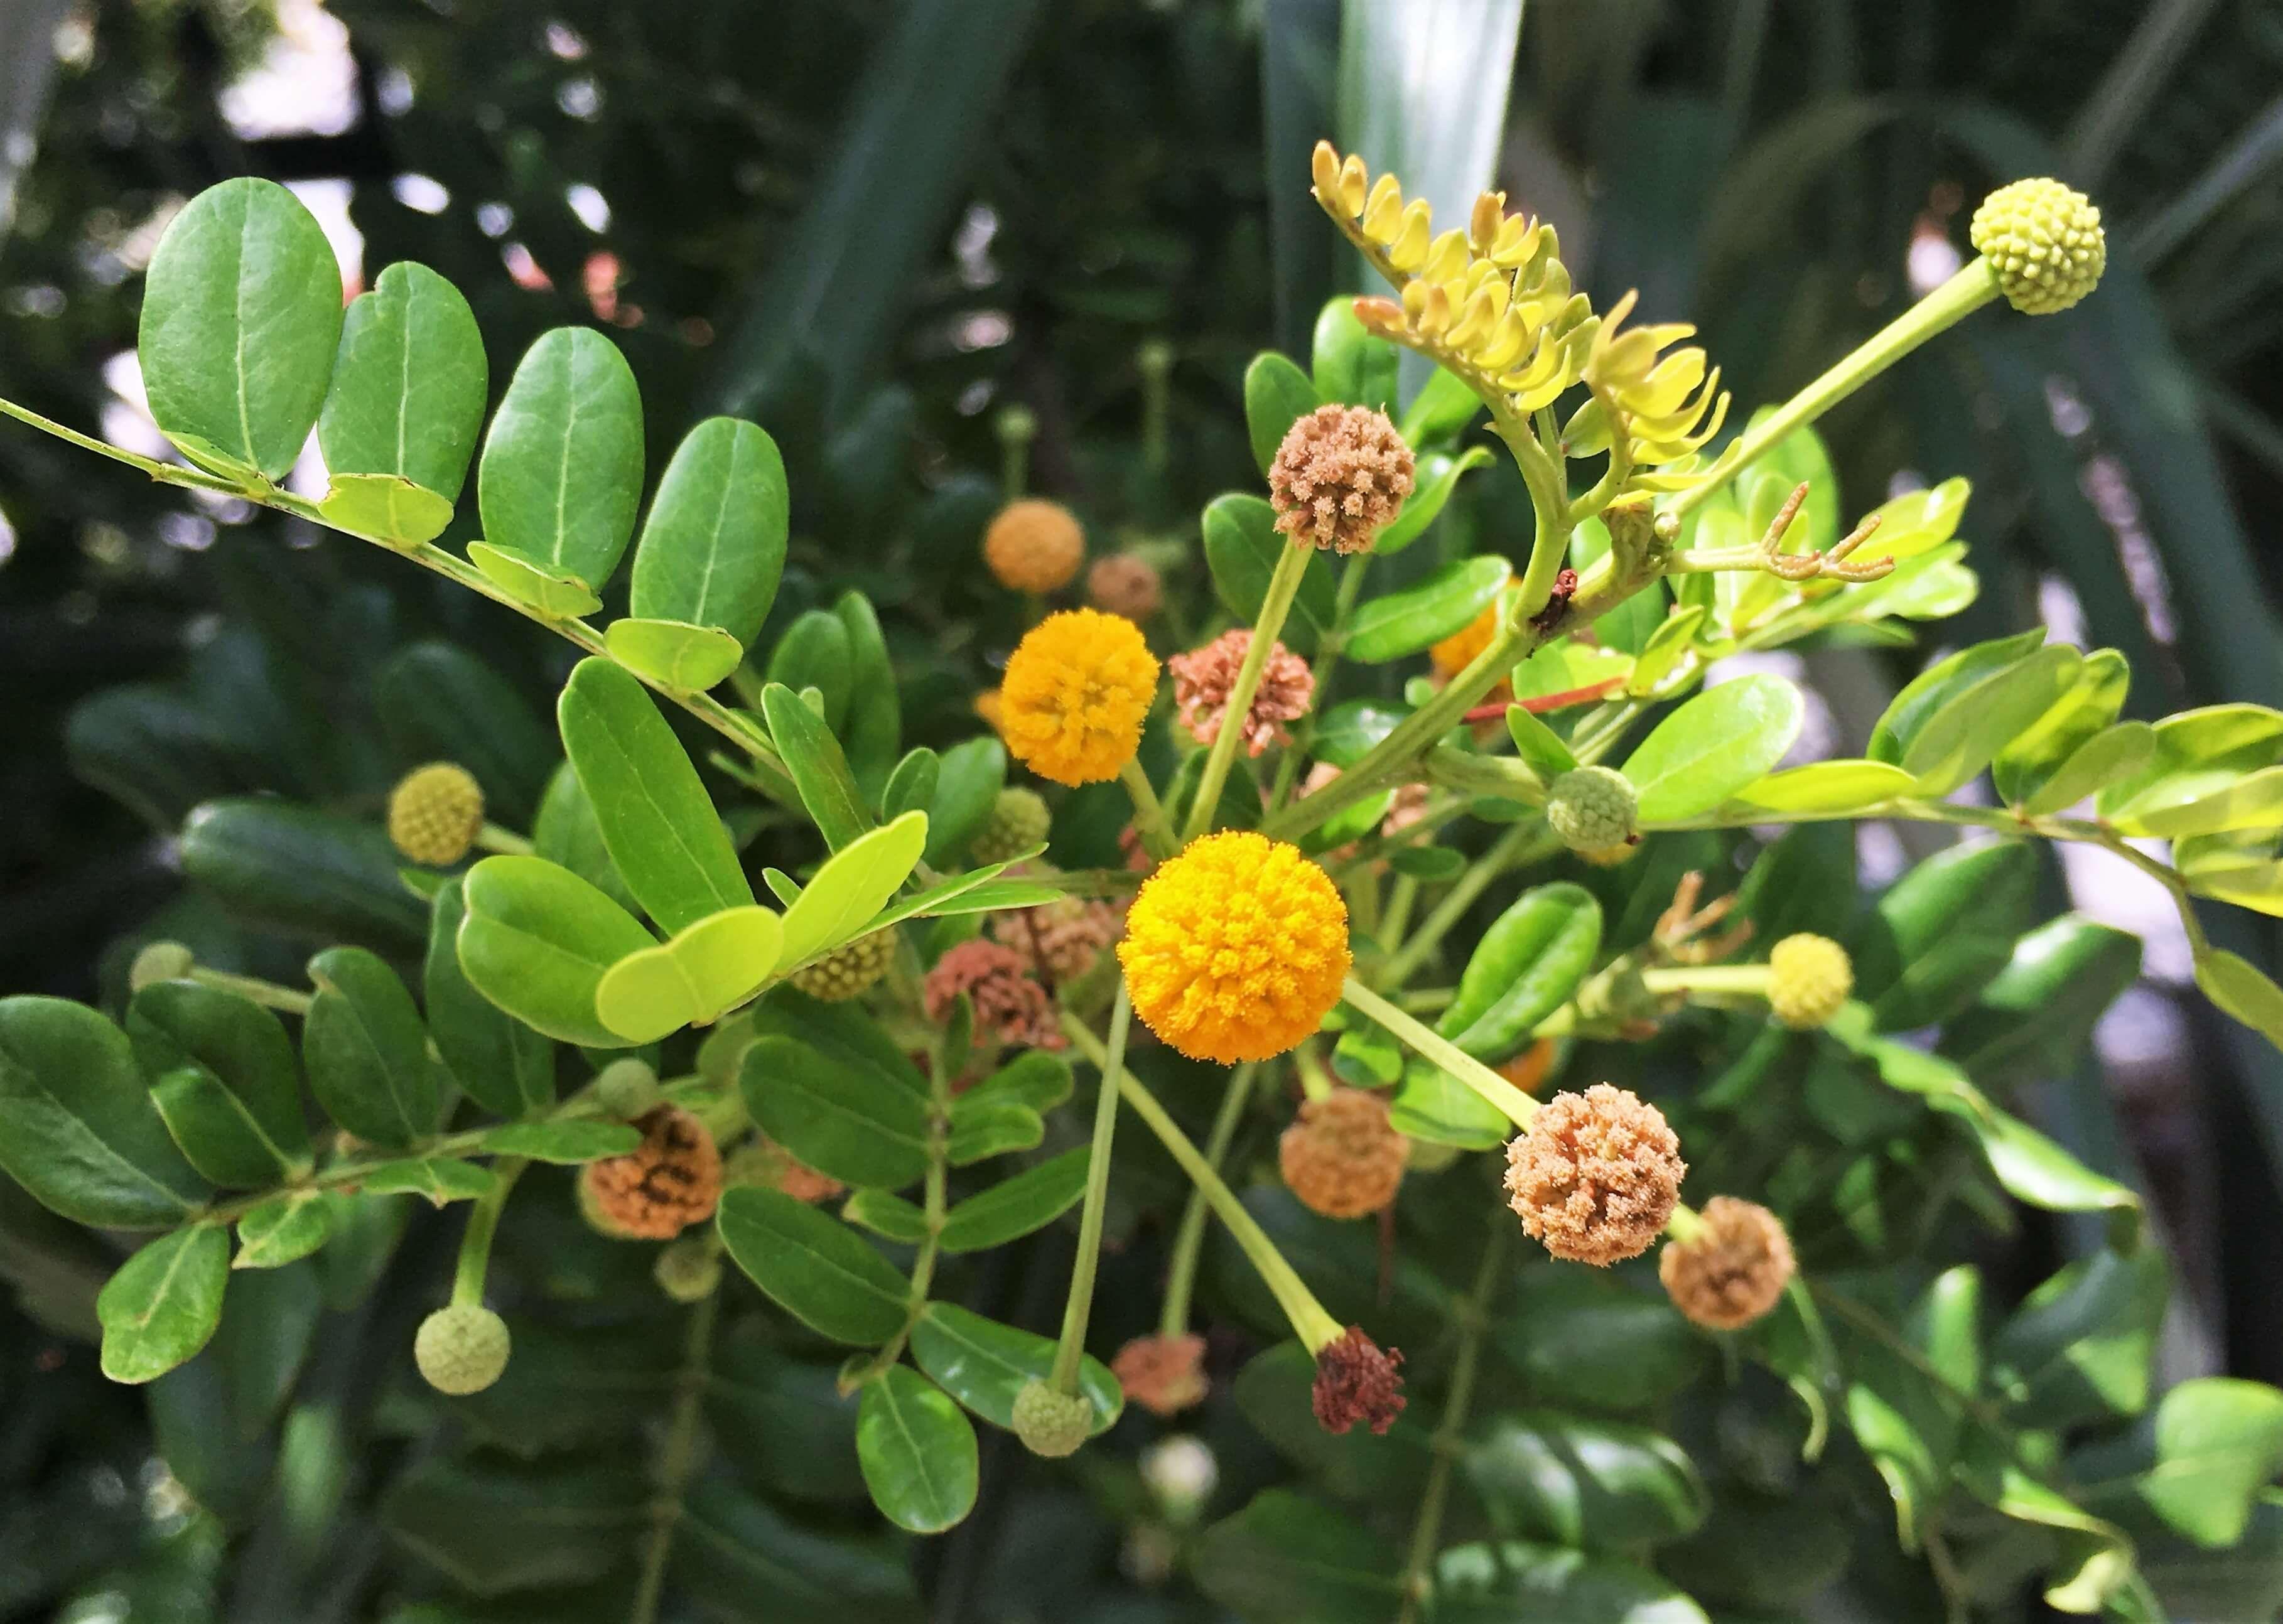 Acacia Choriophylla Cinnecord Flower Family Leguminosae Flowers Plants Fruit